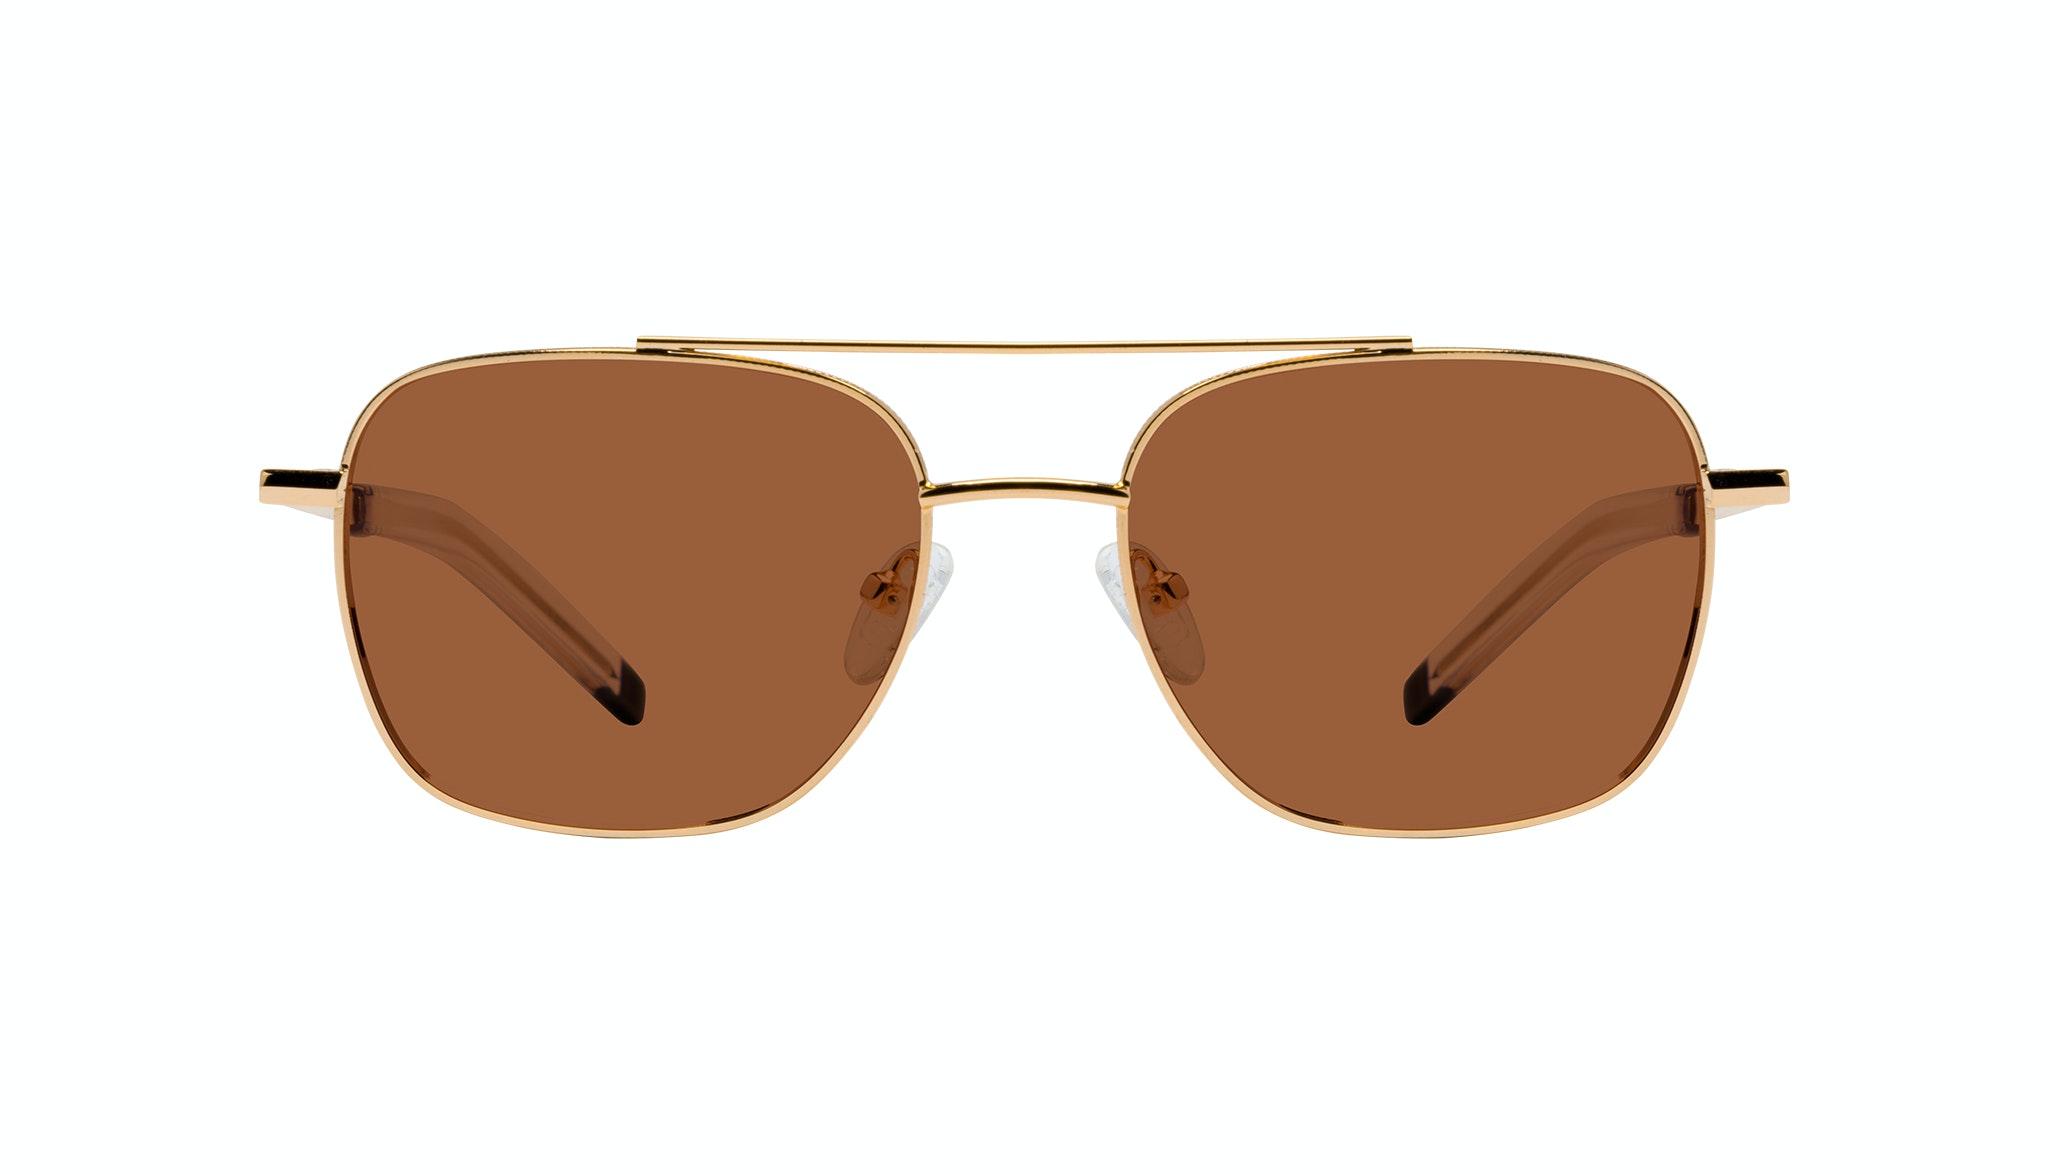 Affordable Fashion Glasses Aviator Sunglasses Men Drift Gold Front